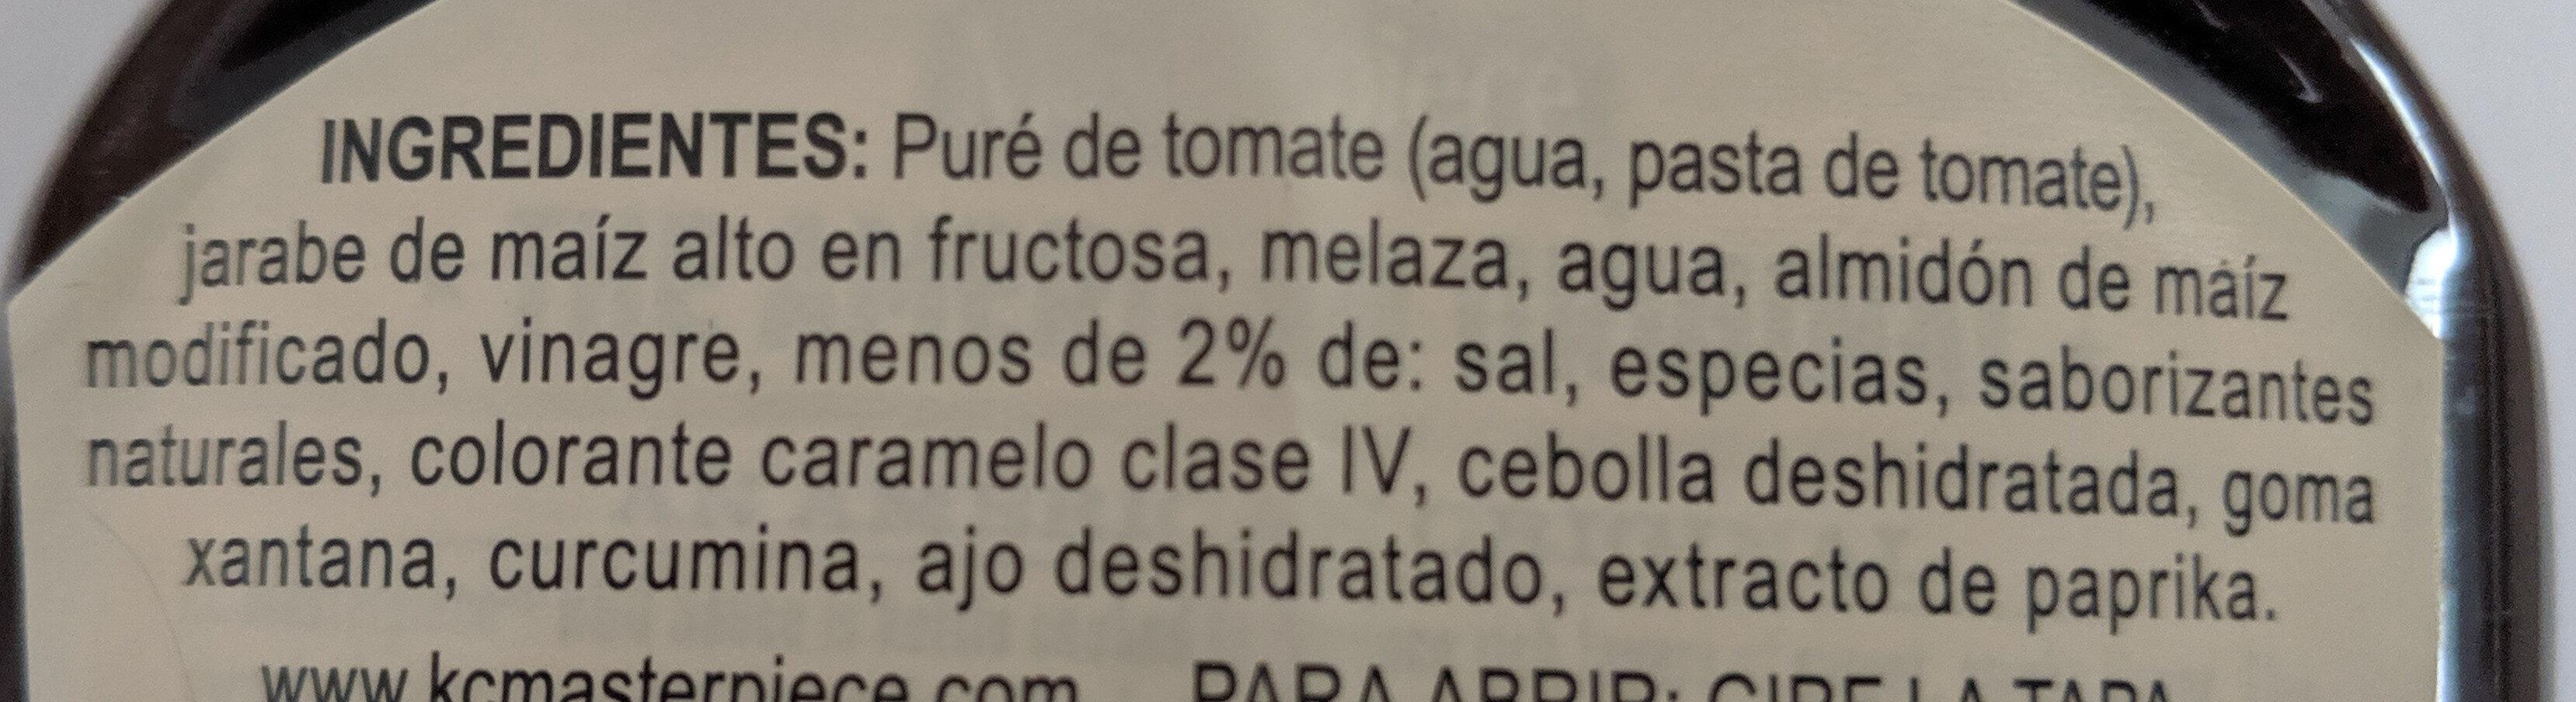 Salsa barbacoa The american original - Ingredients